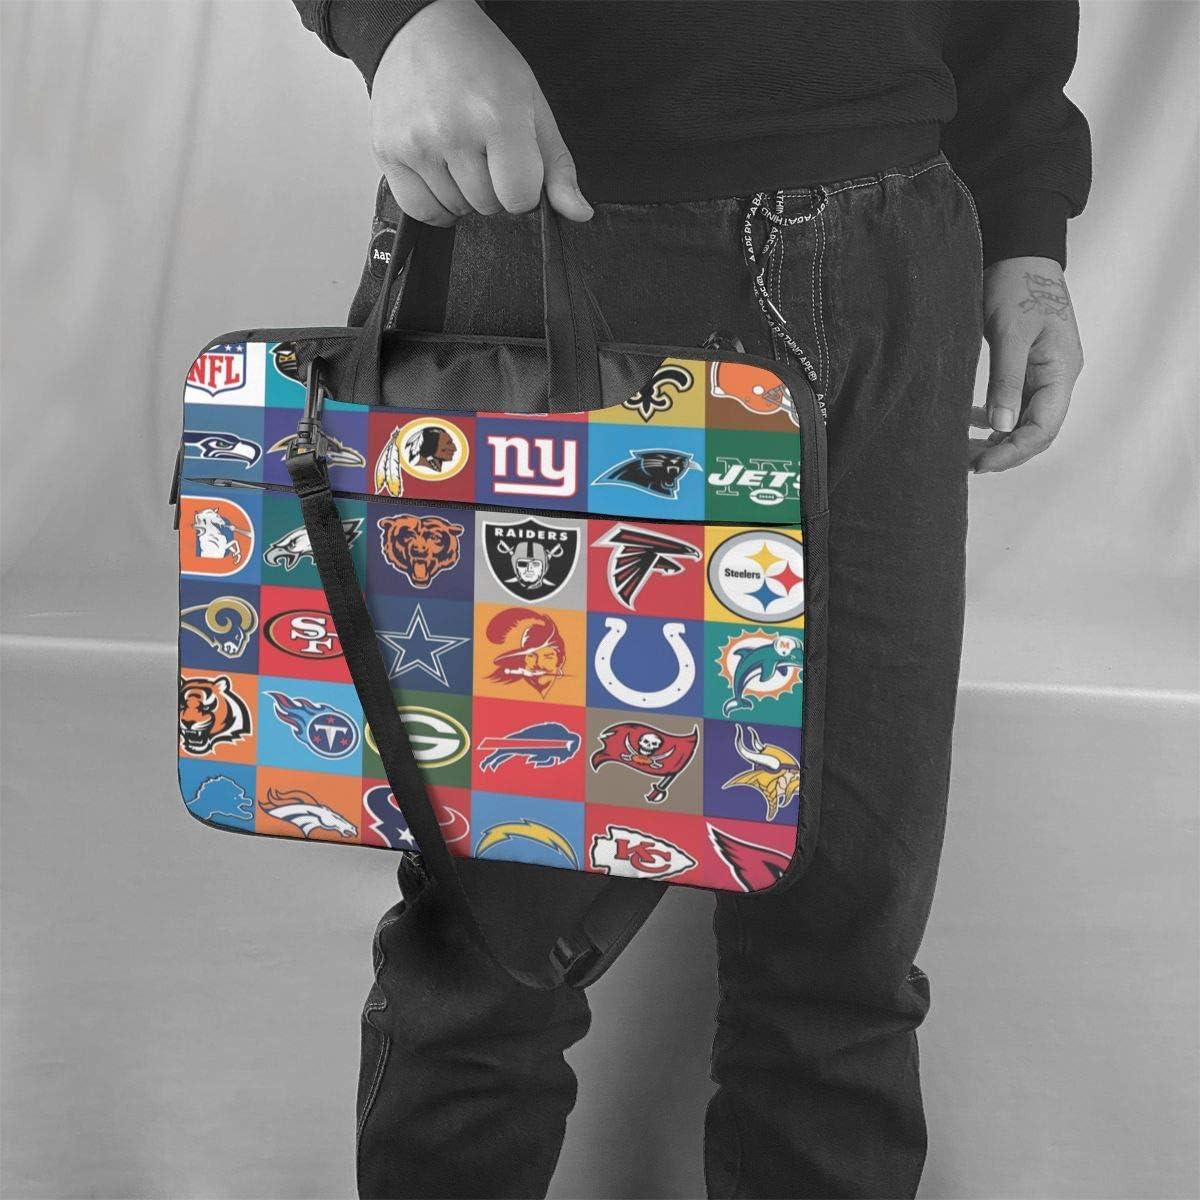 ALHOKLAus 1 Stylish Customized Laptop Bag, Portable Shoulder Bag, Crossbody Bag and Briefcase (3 Sizes)